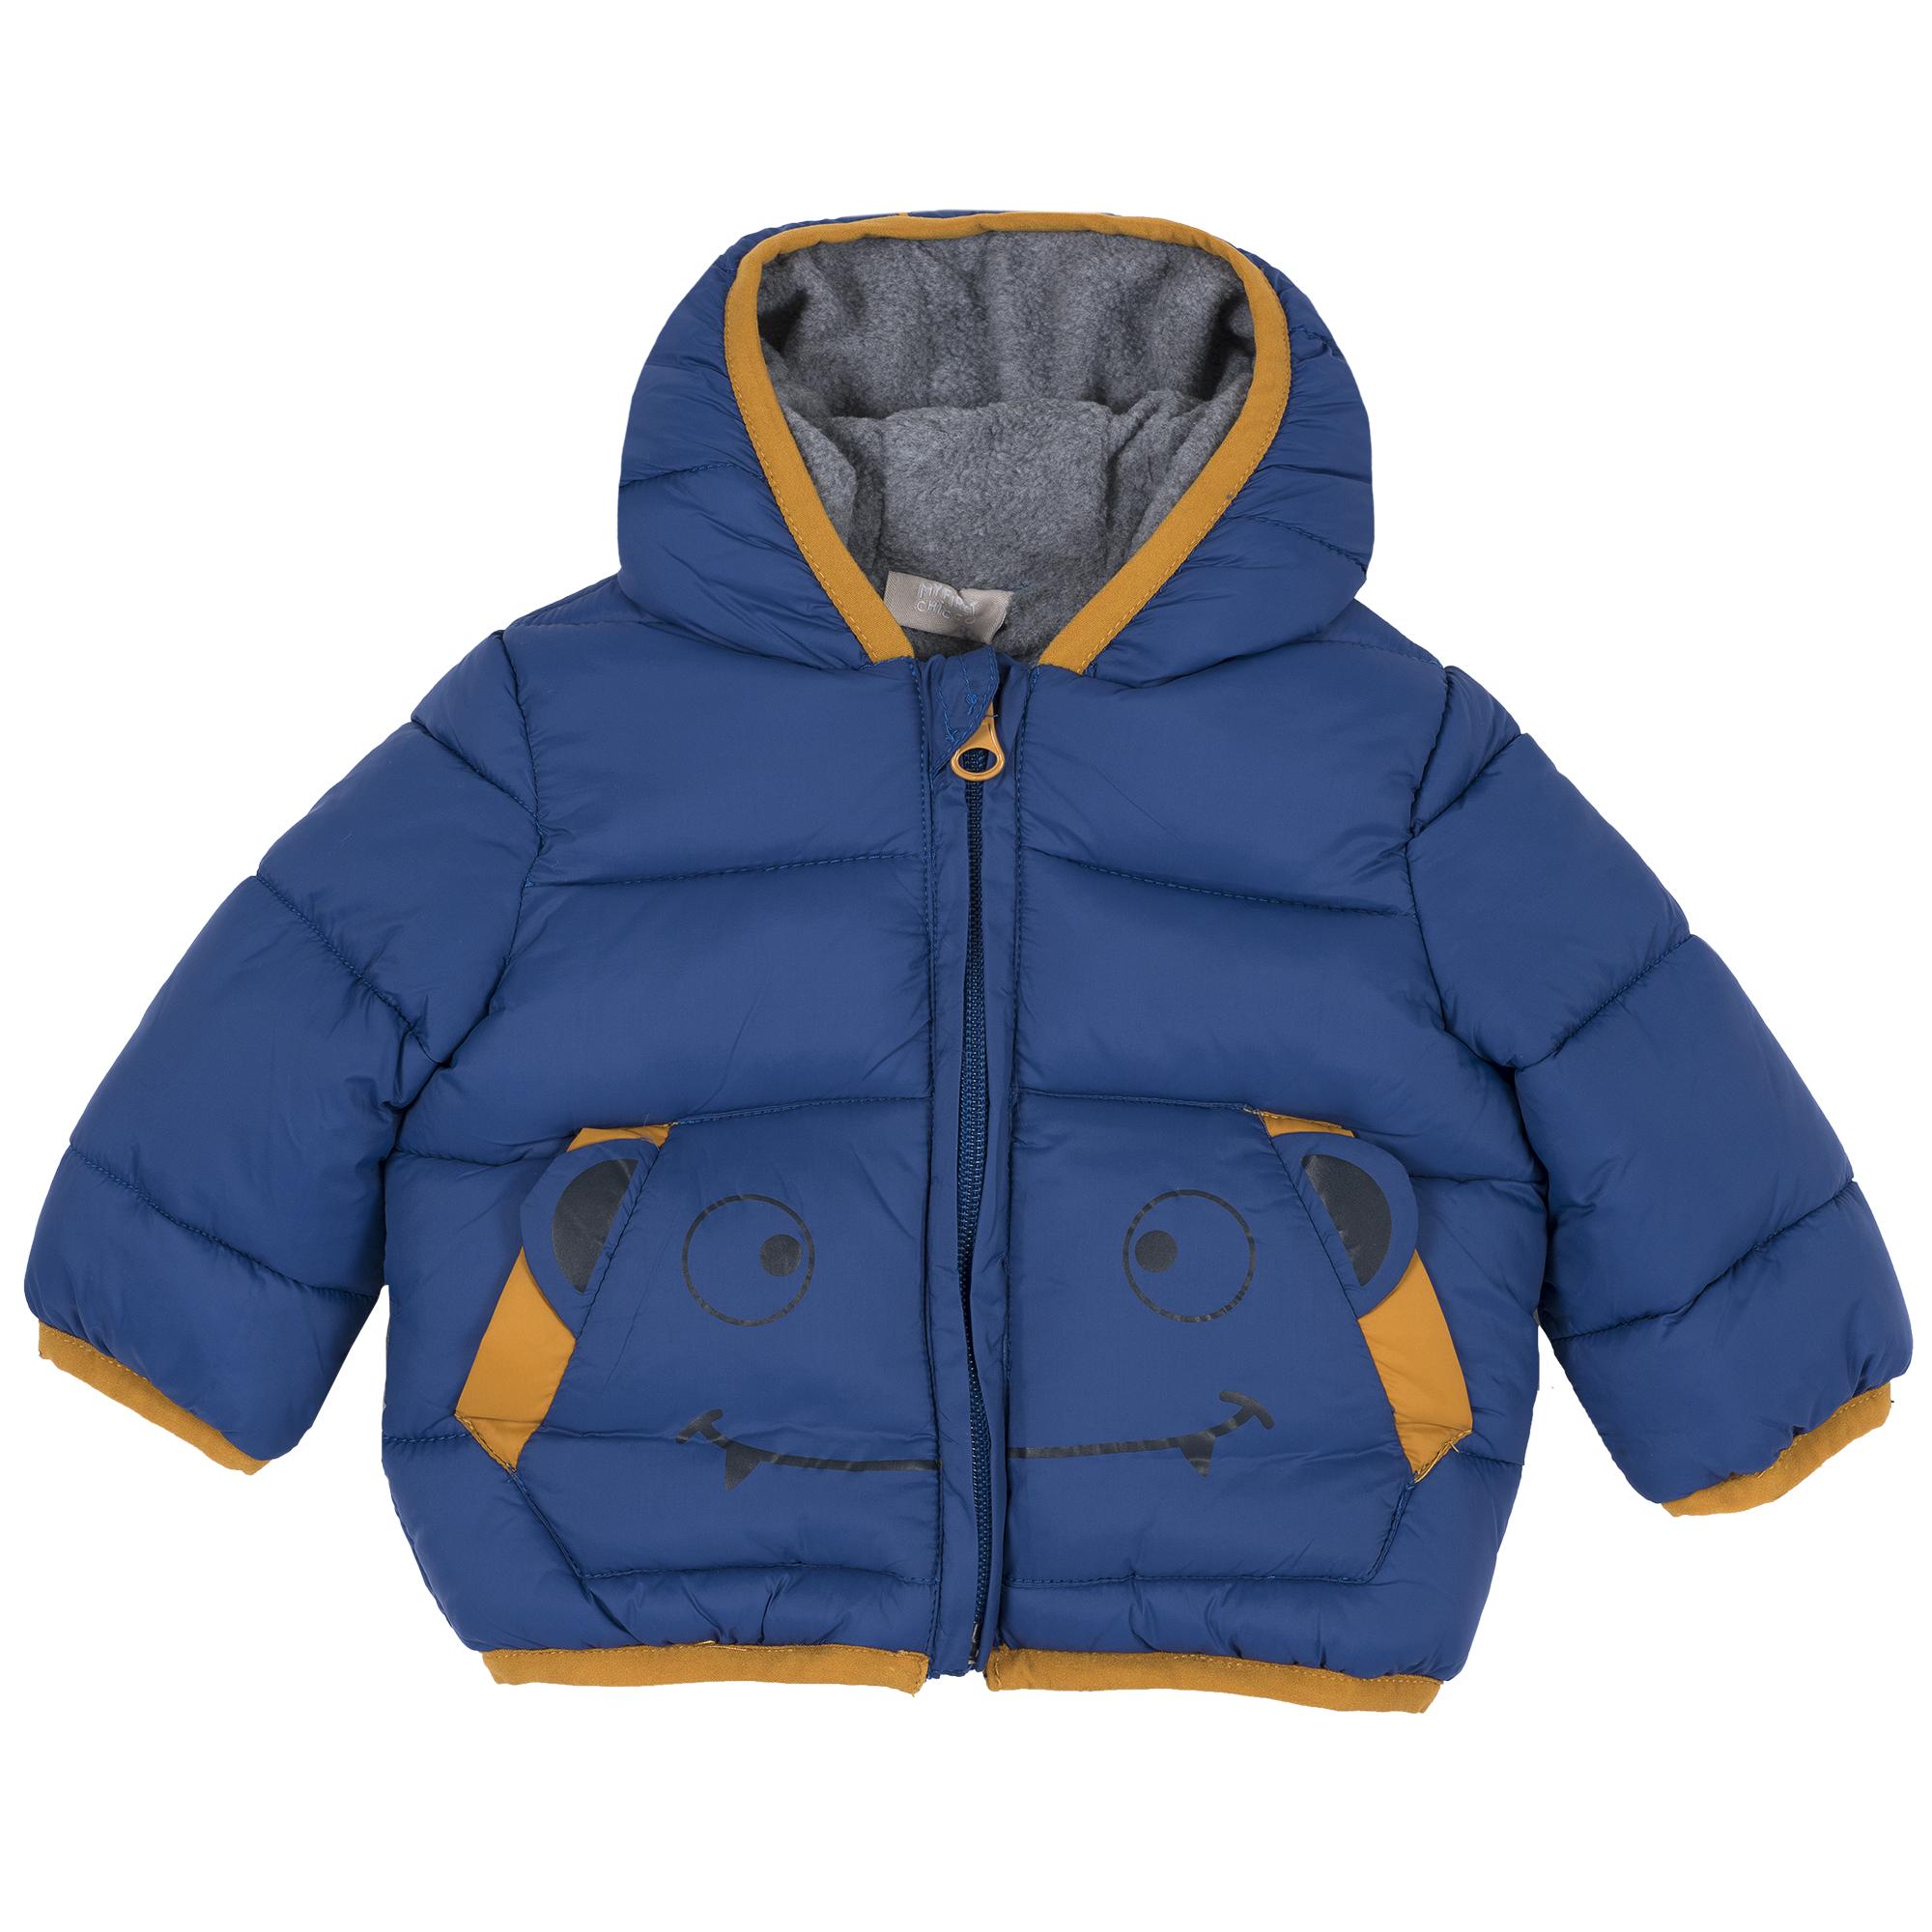 Jacheta Copii Chicco Ecodown, Albastru, 87437 imagine